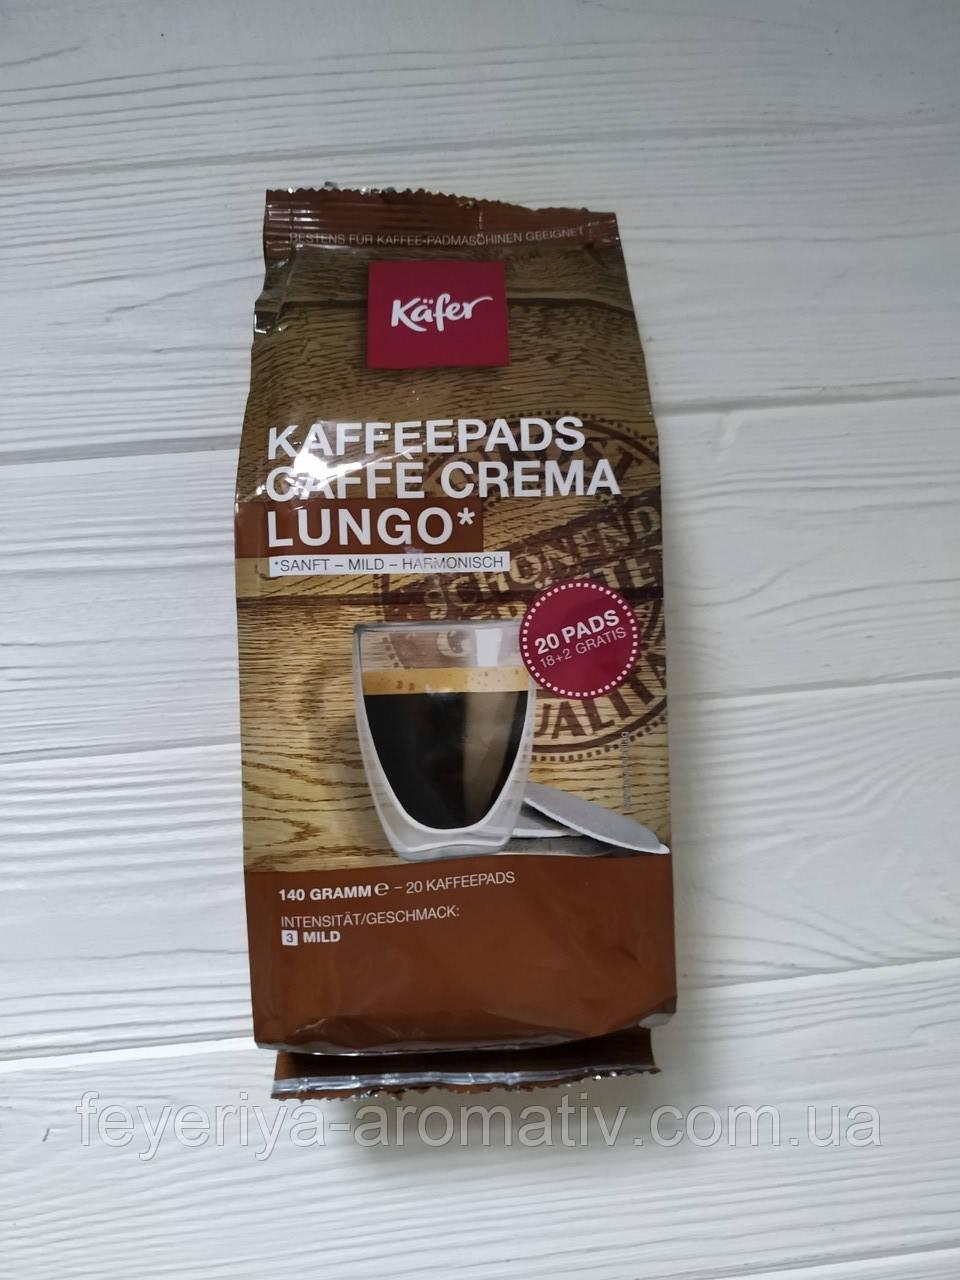 Кофе в капсулах Kafer Kaffeepads Kaffe Crema Lungo 20шт., 140гр (Германия)